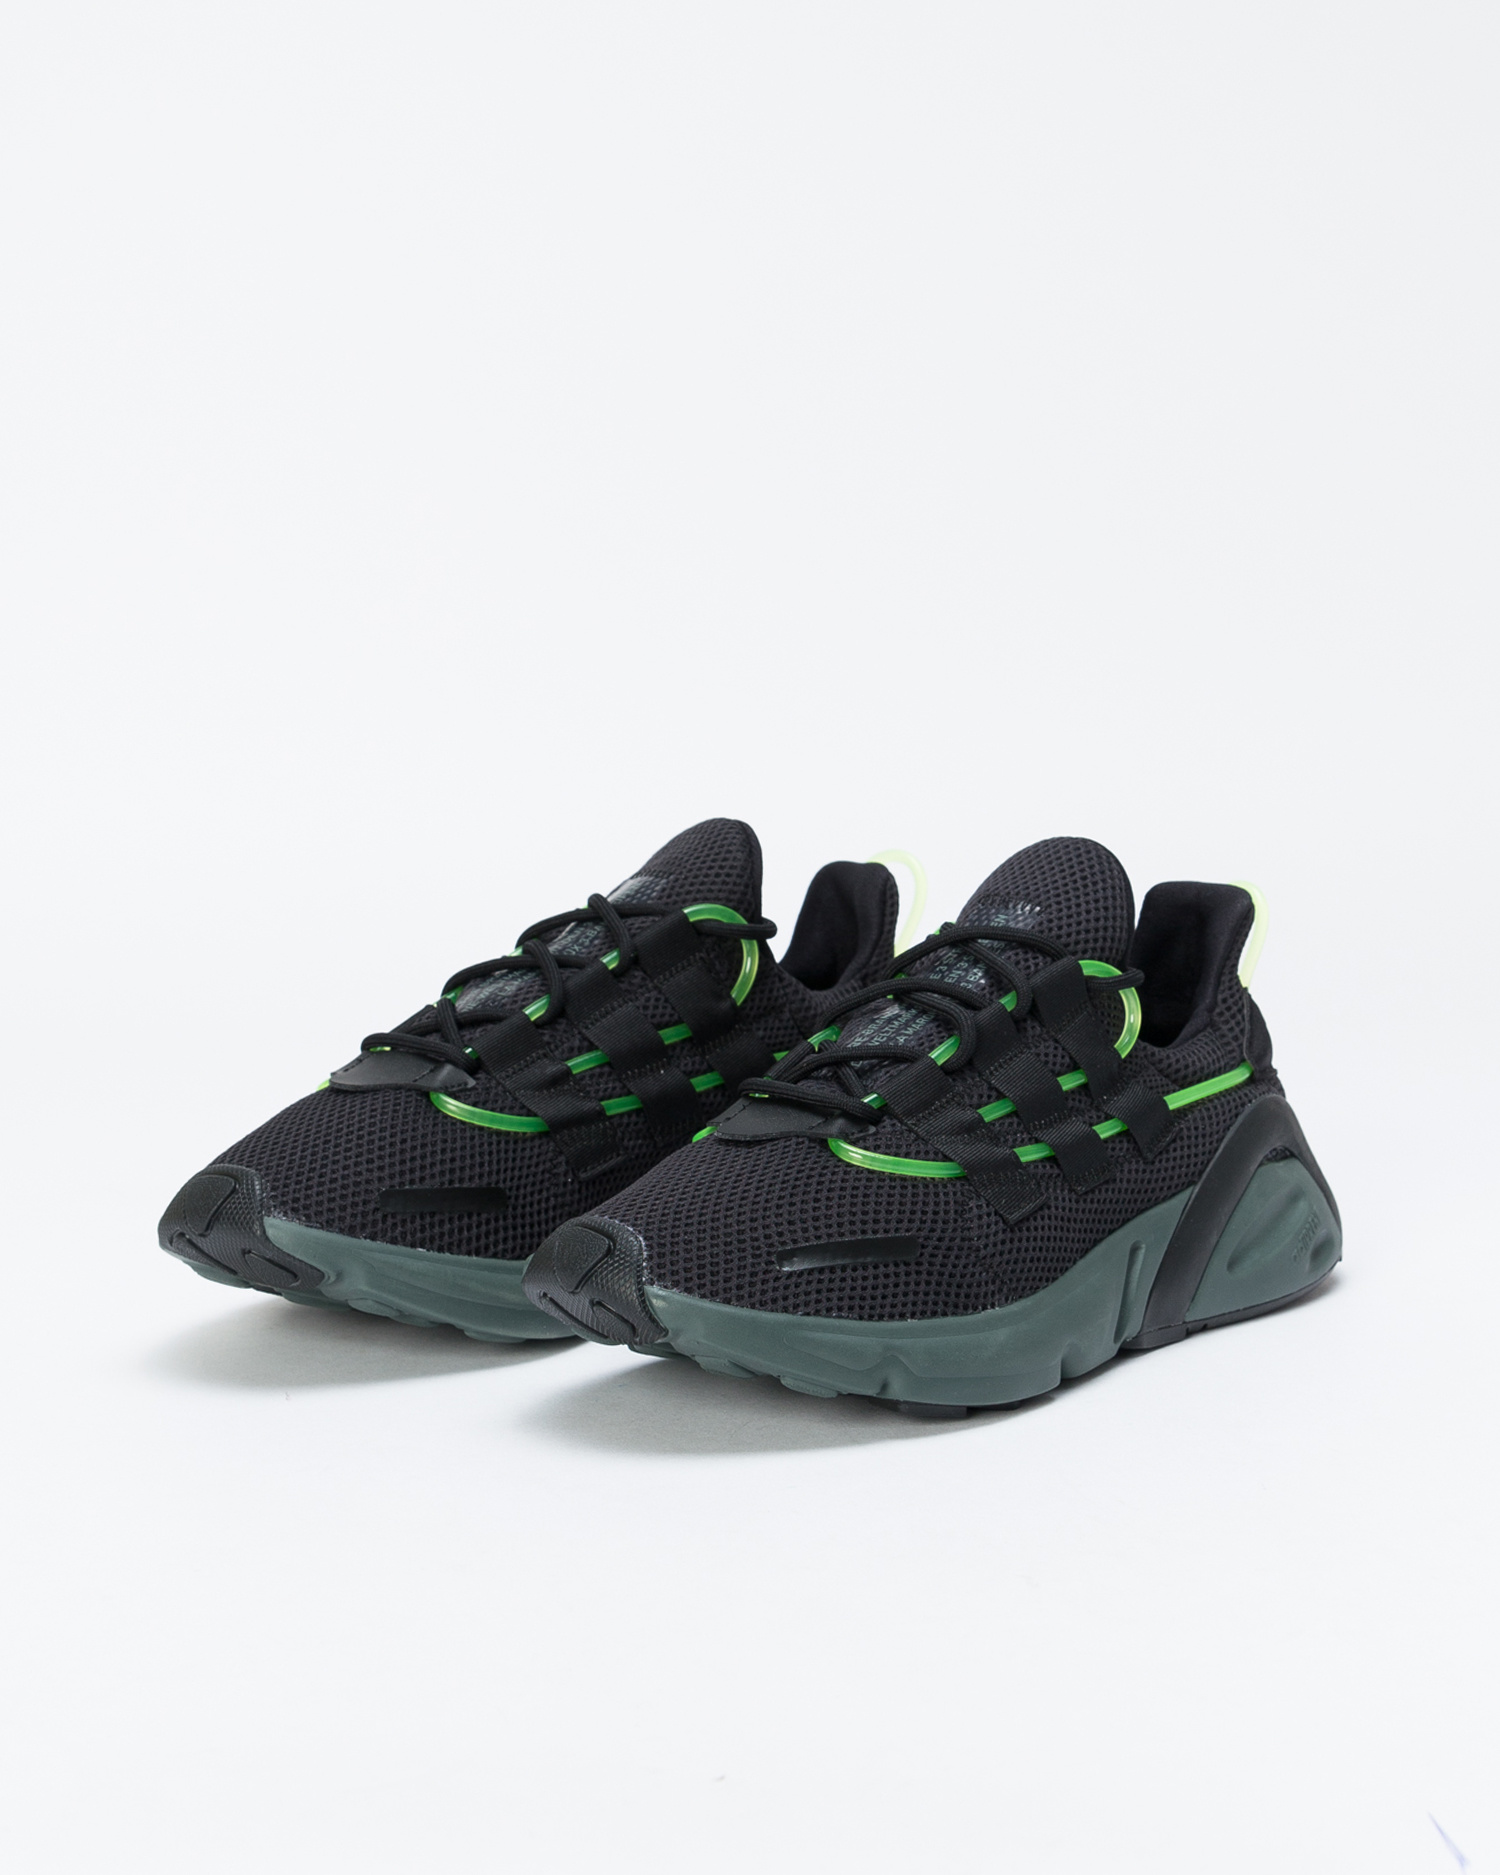 adidas LXCON CORE BLACK/CORE BLACK/CORE BLACK